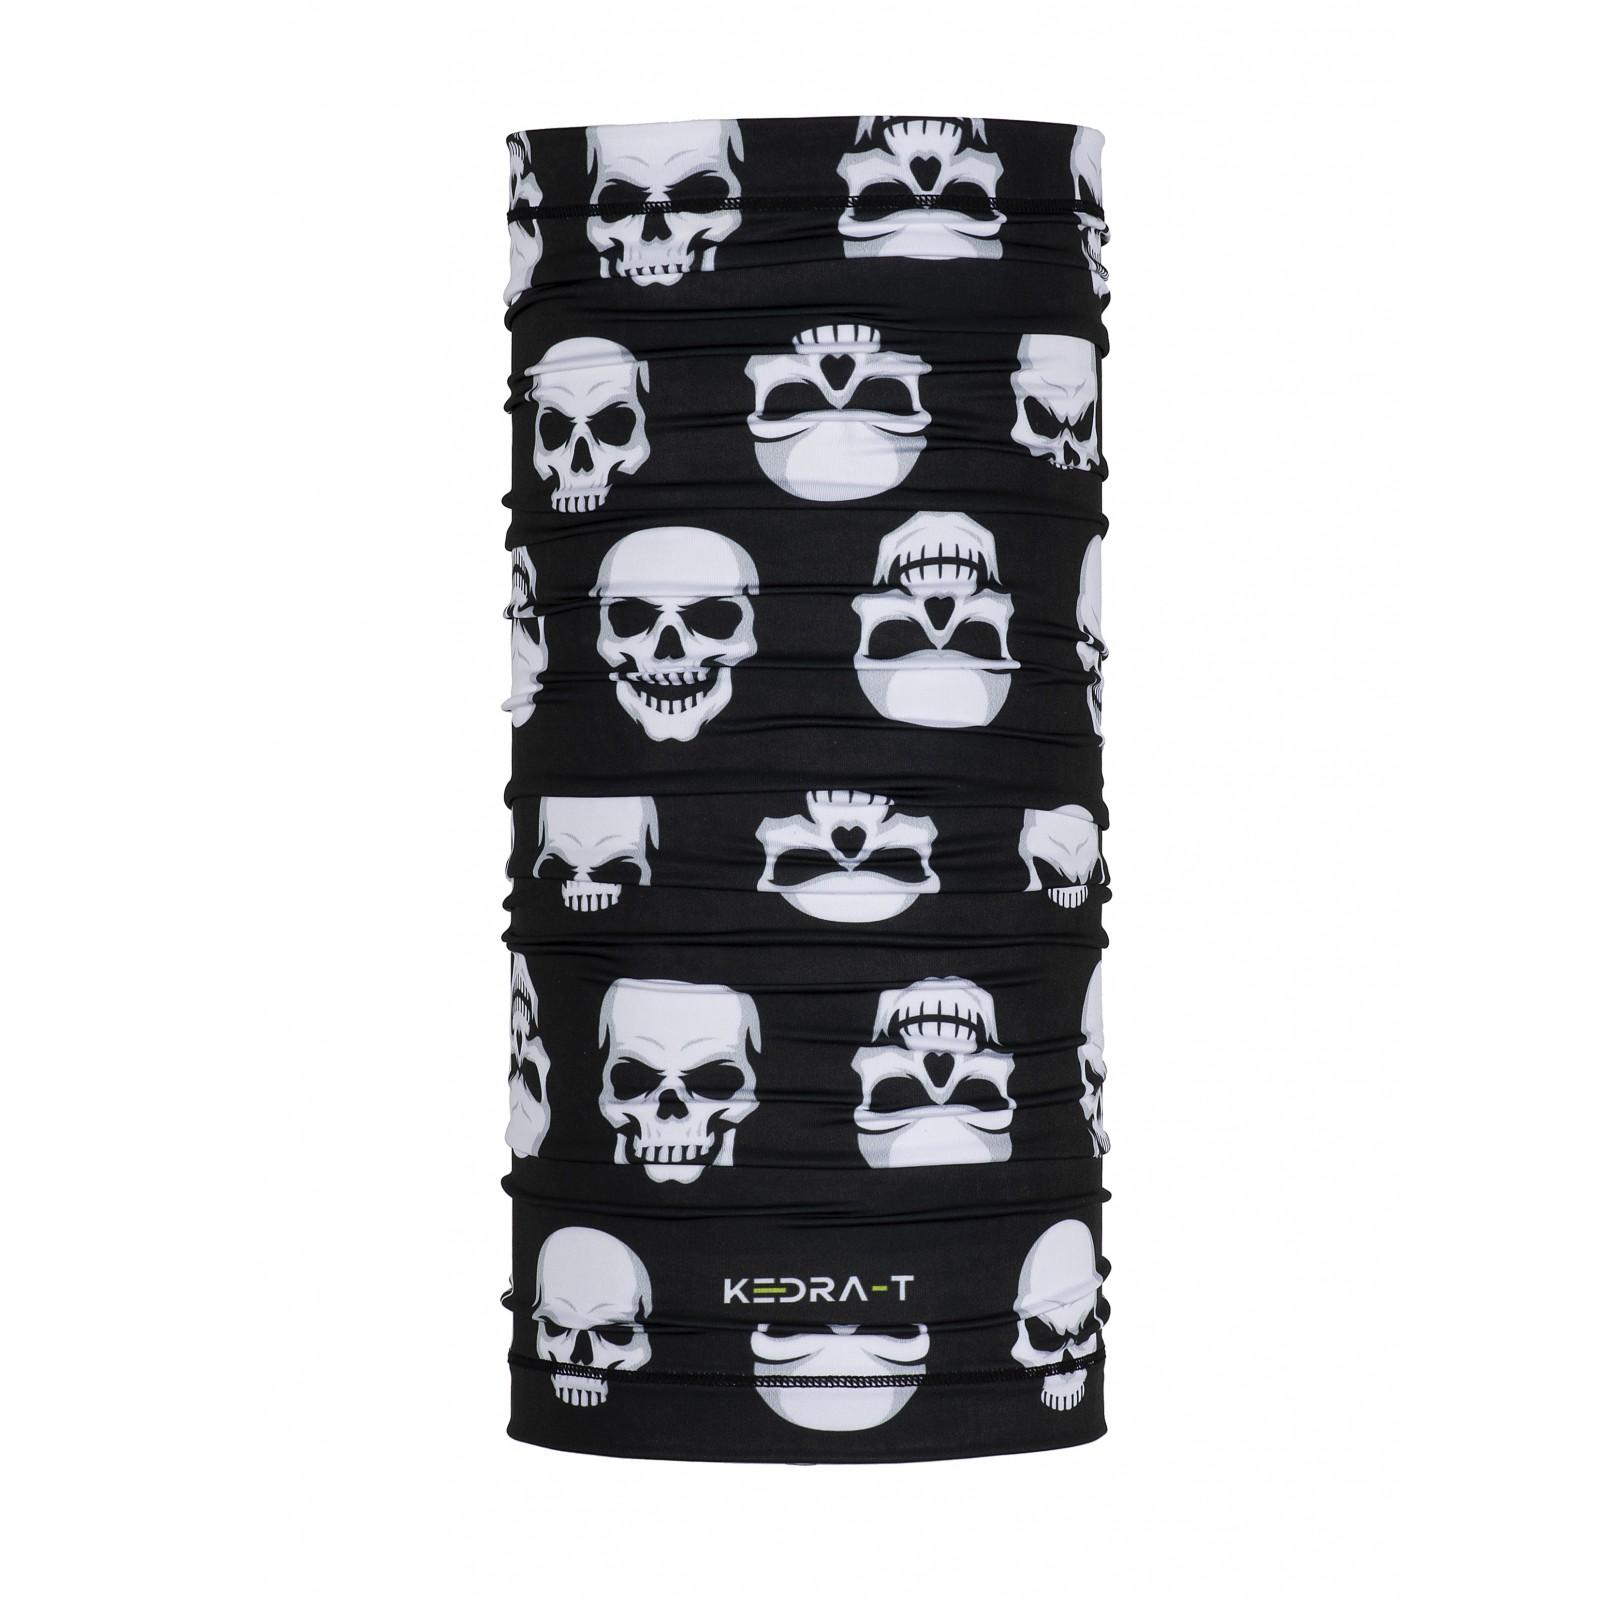 Bandana Media Skulls